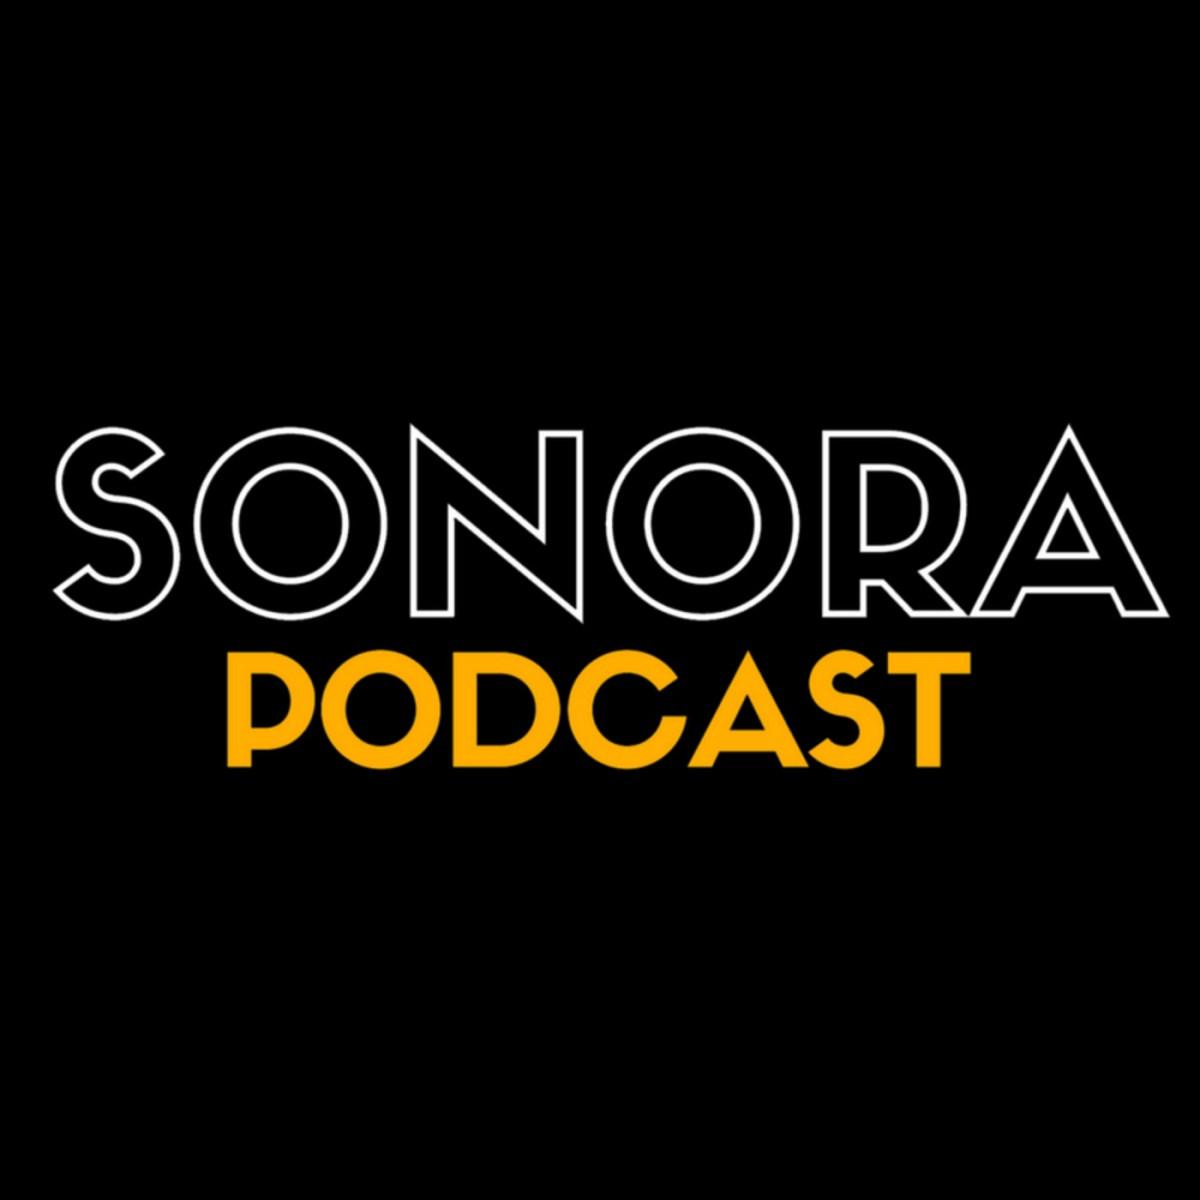 Sonora Podcast